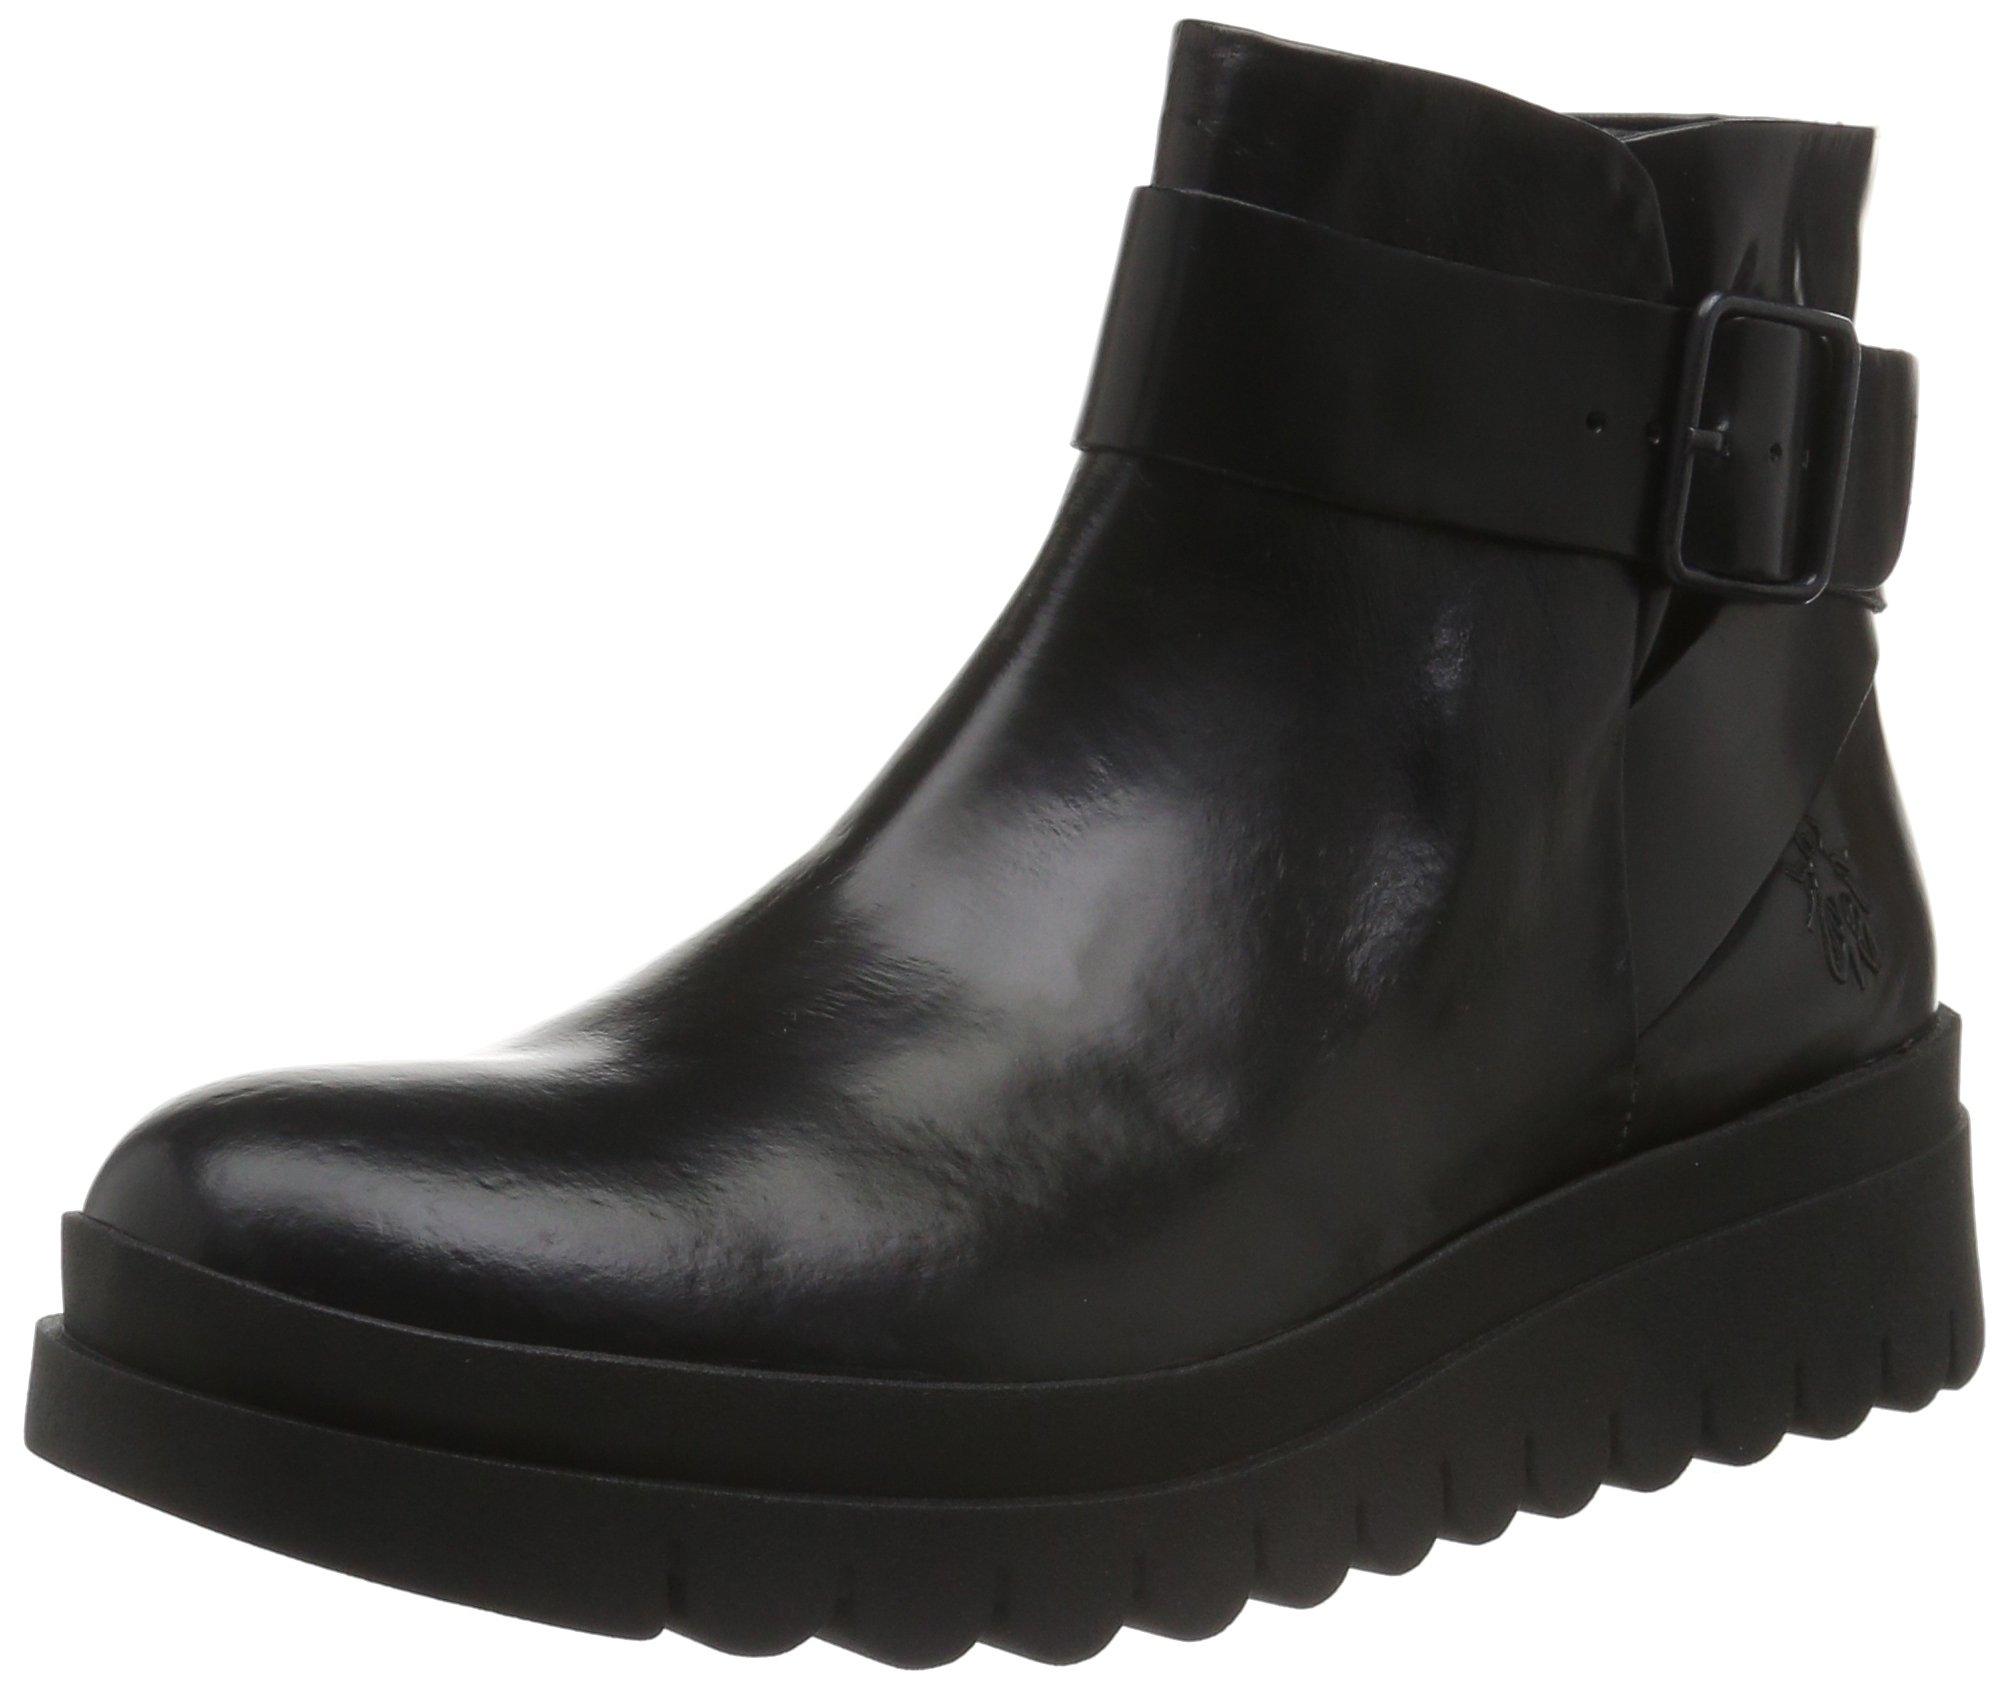 Fly London Womens Halp 773 Fly Glass Black Leather Boots 38 EU